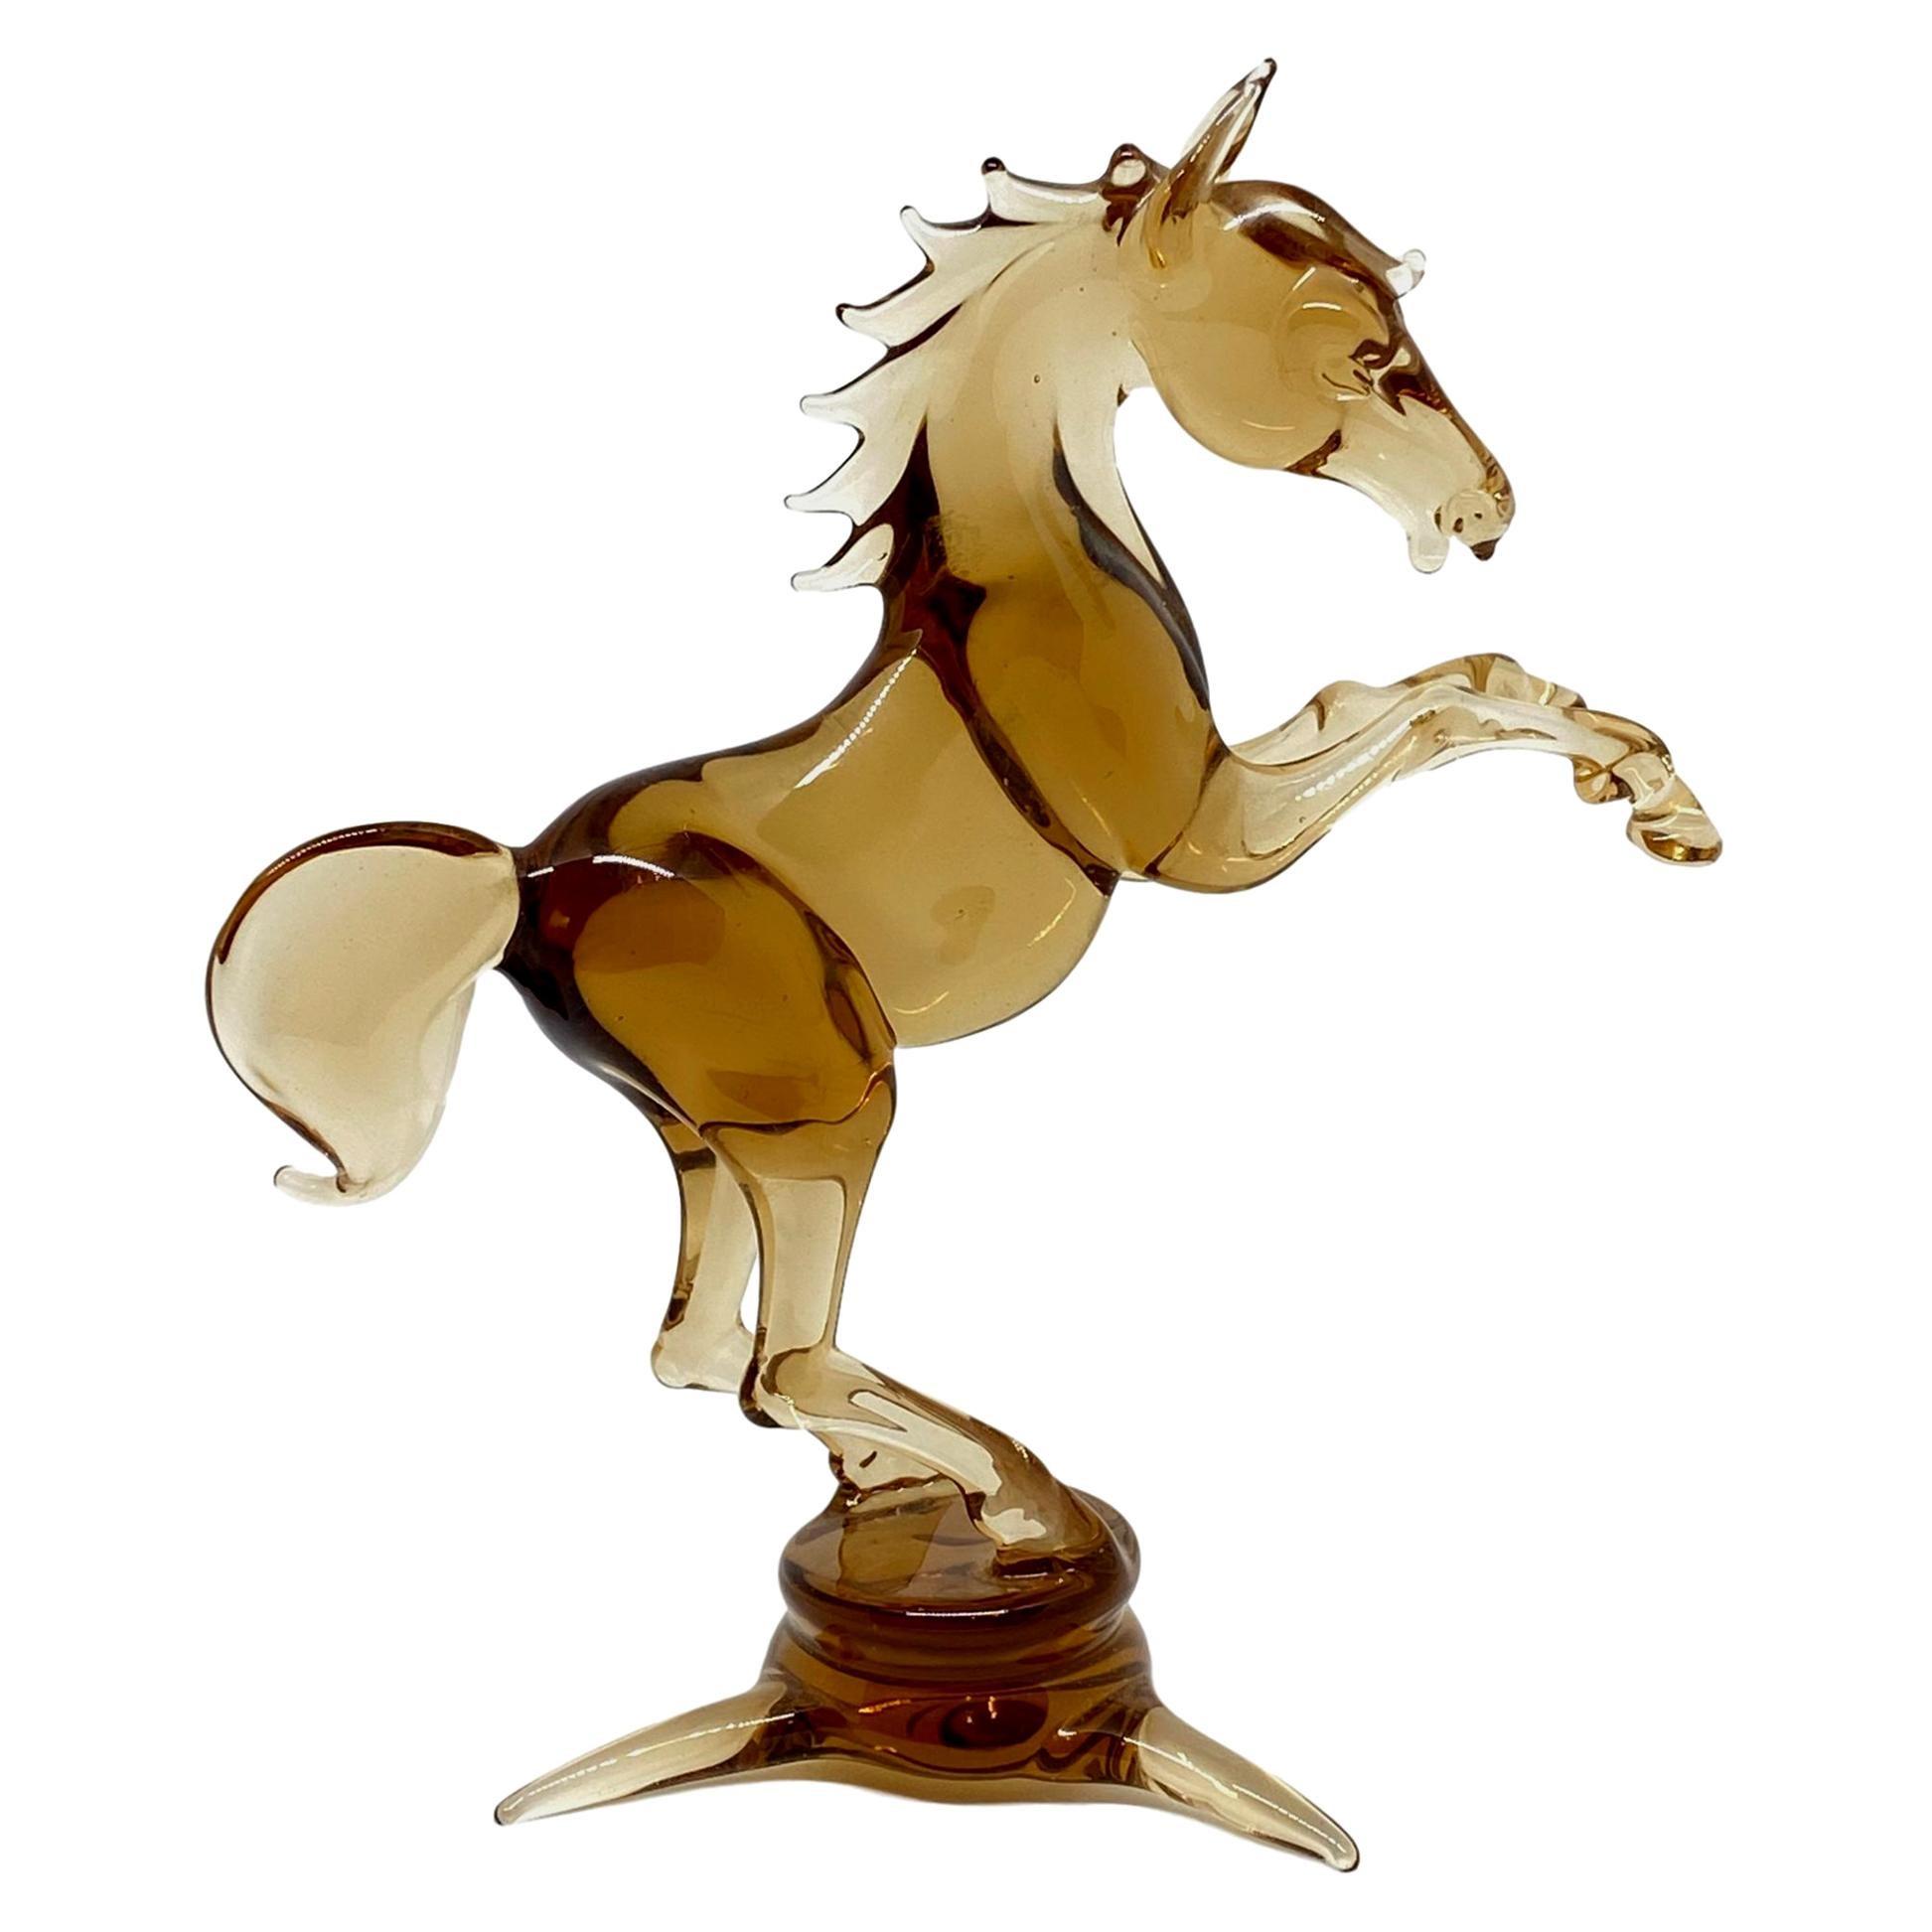 Jumping Horse Bimini Style Art Glass Sculpture Figure Mid-20th Century